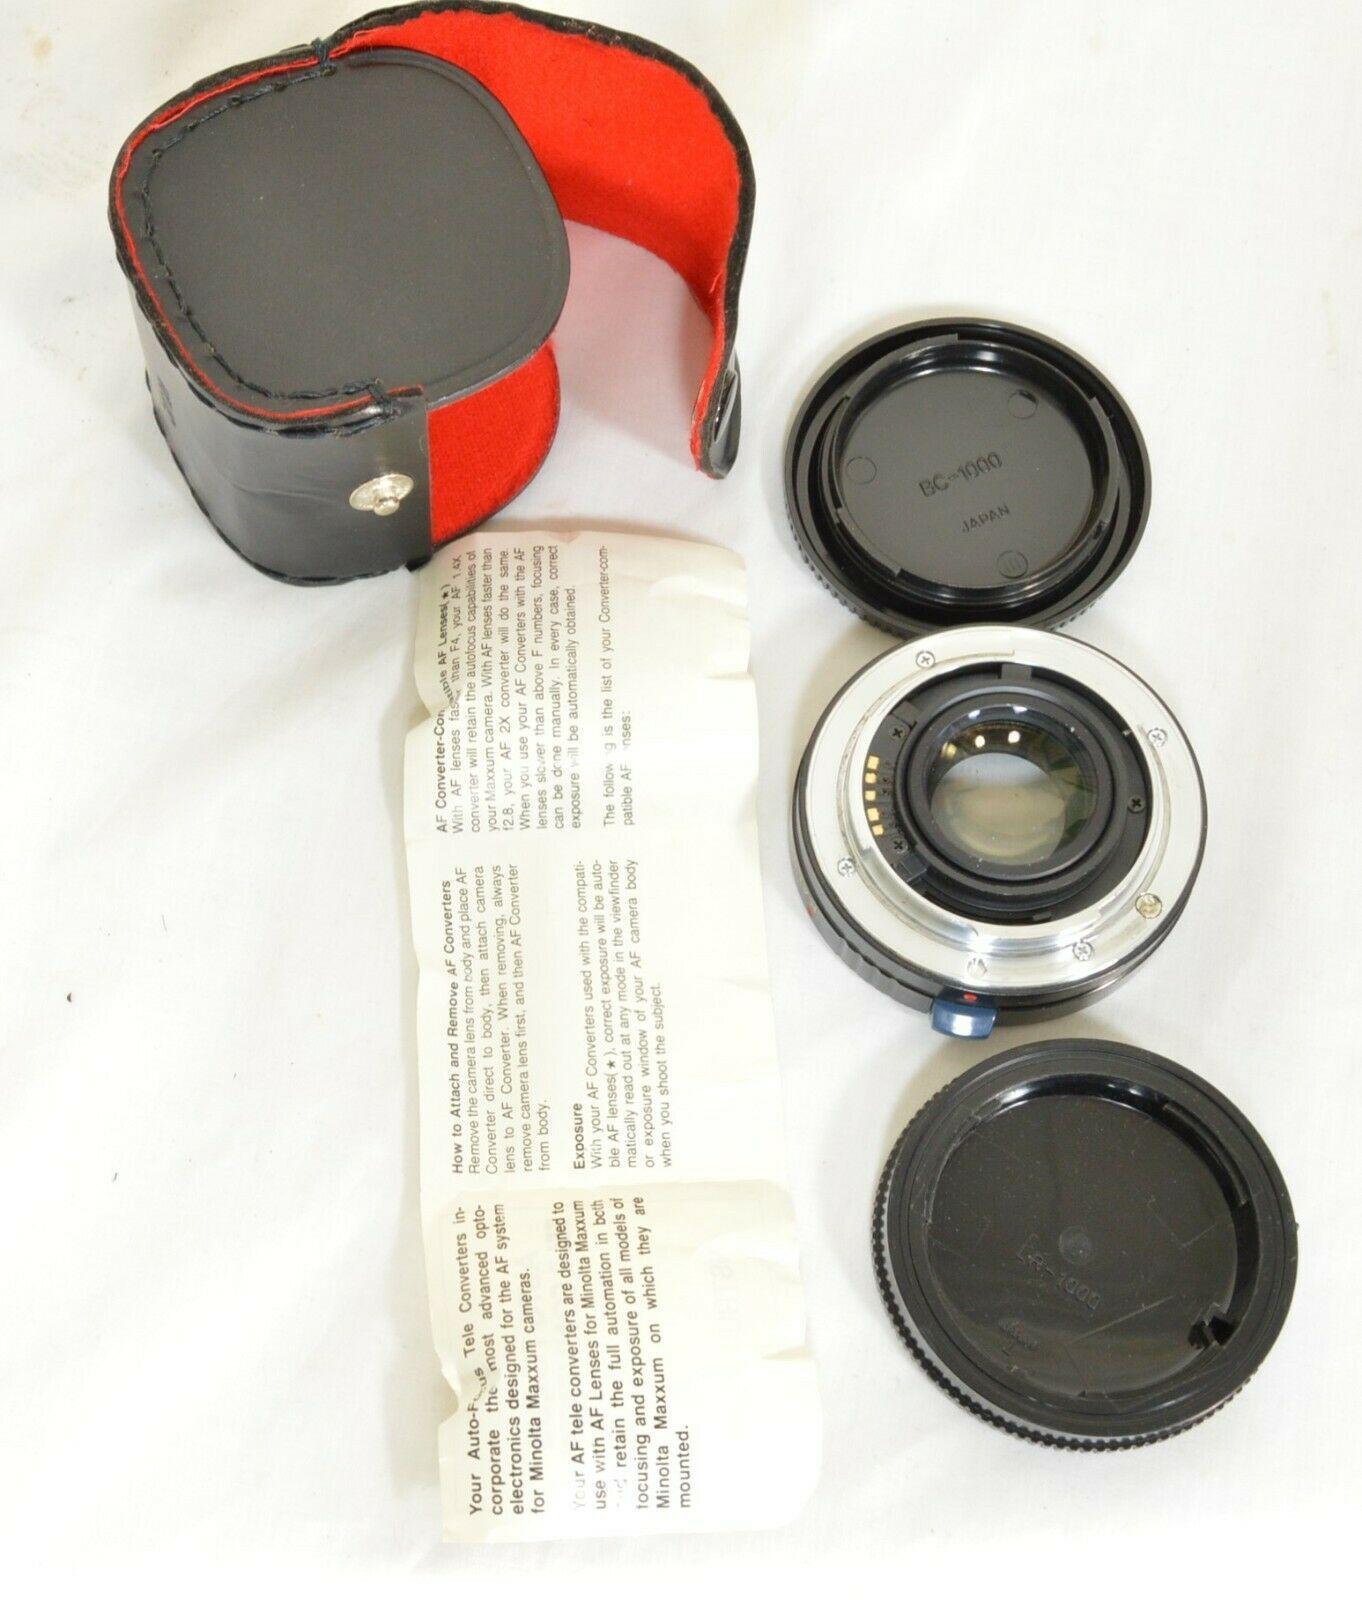 Kalimar 1.4 X M/AF Tele Converter Auto Focus camera lens w/ case & instructions image 2